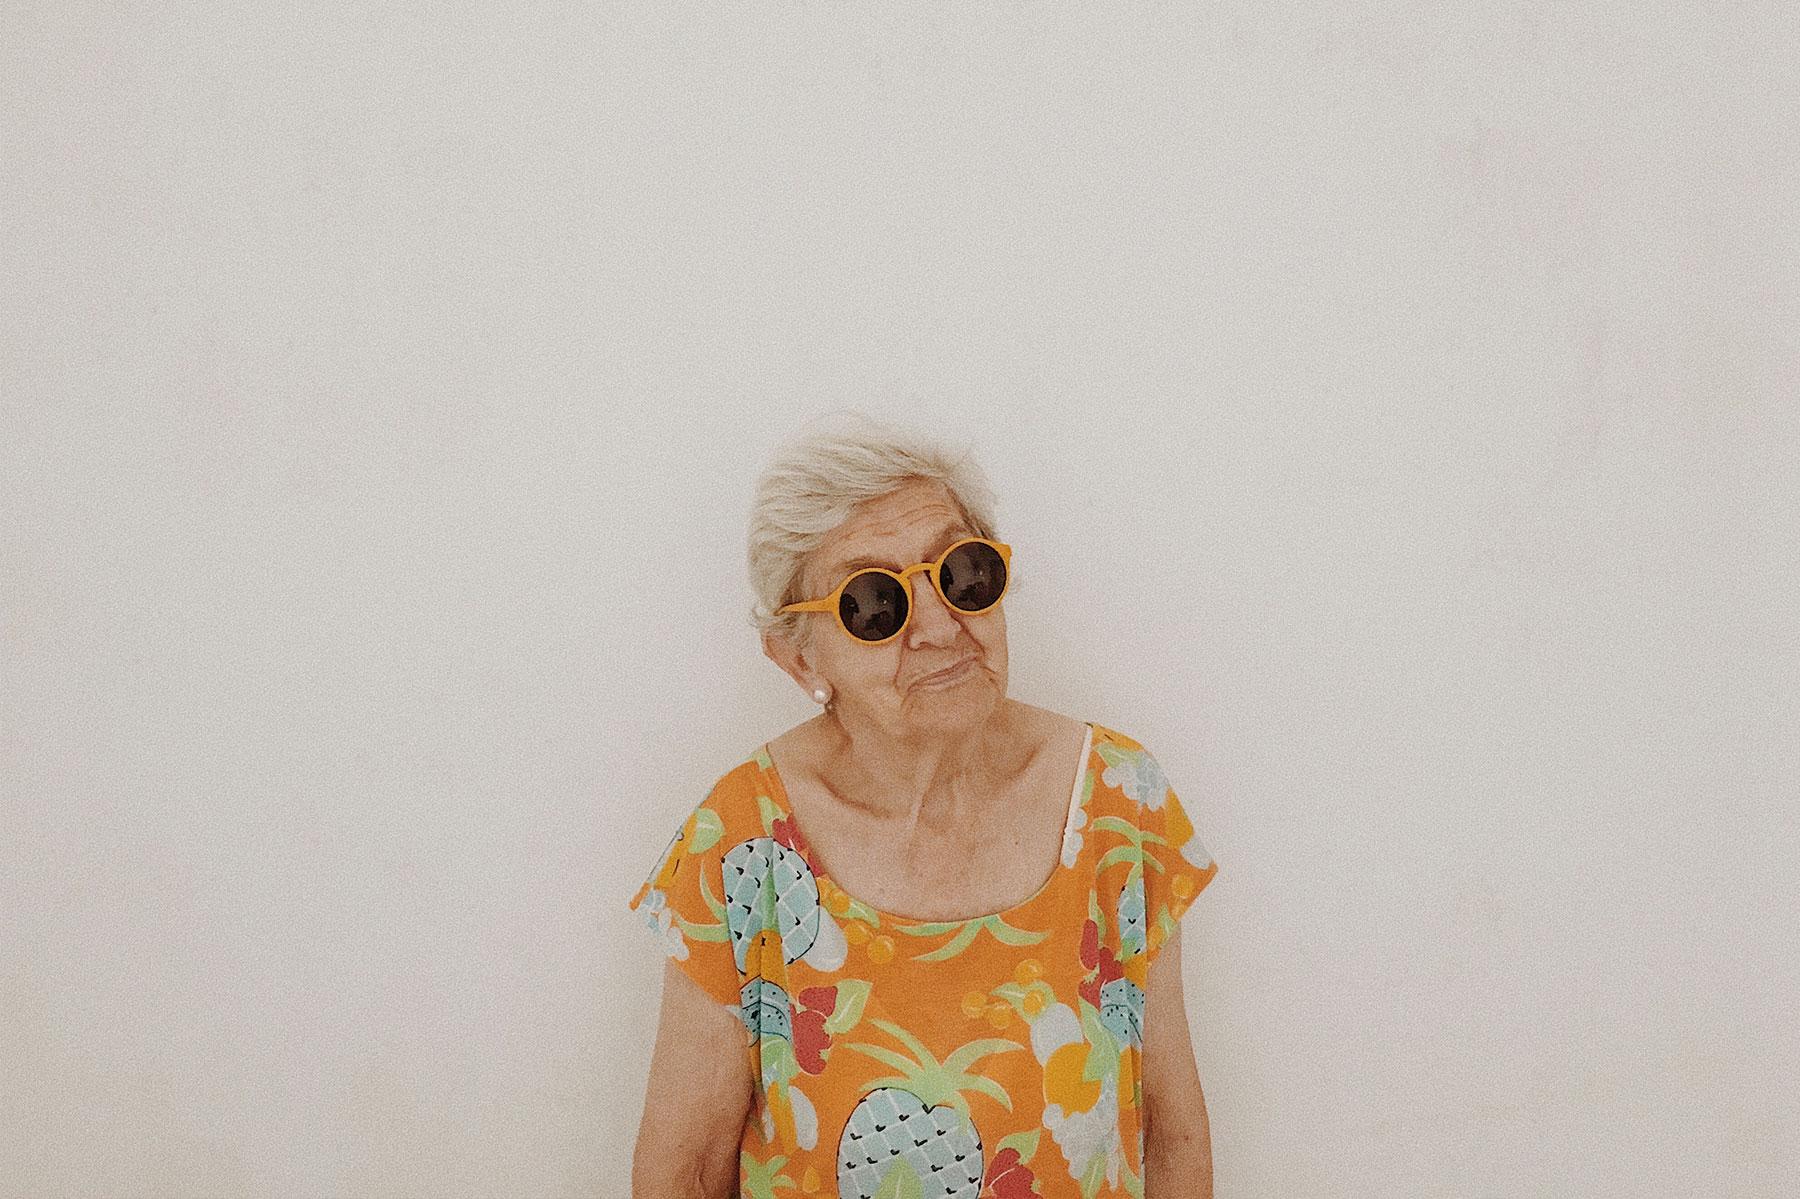 modelo abuela gafas sol 3d printed